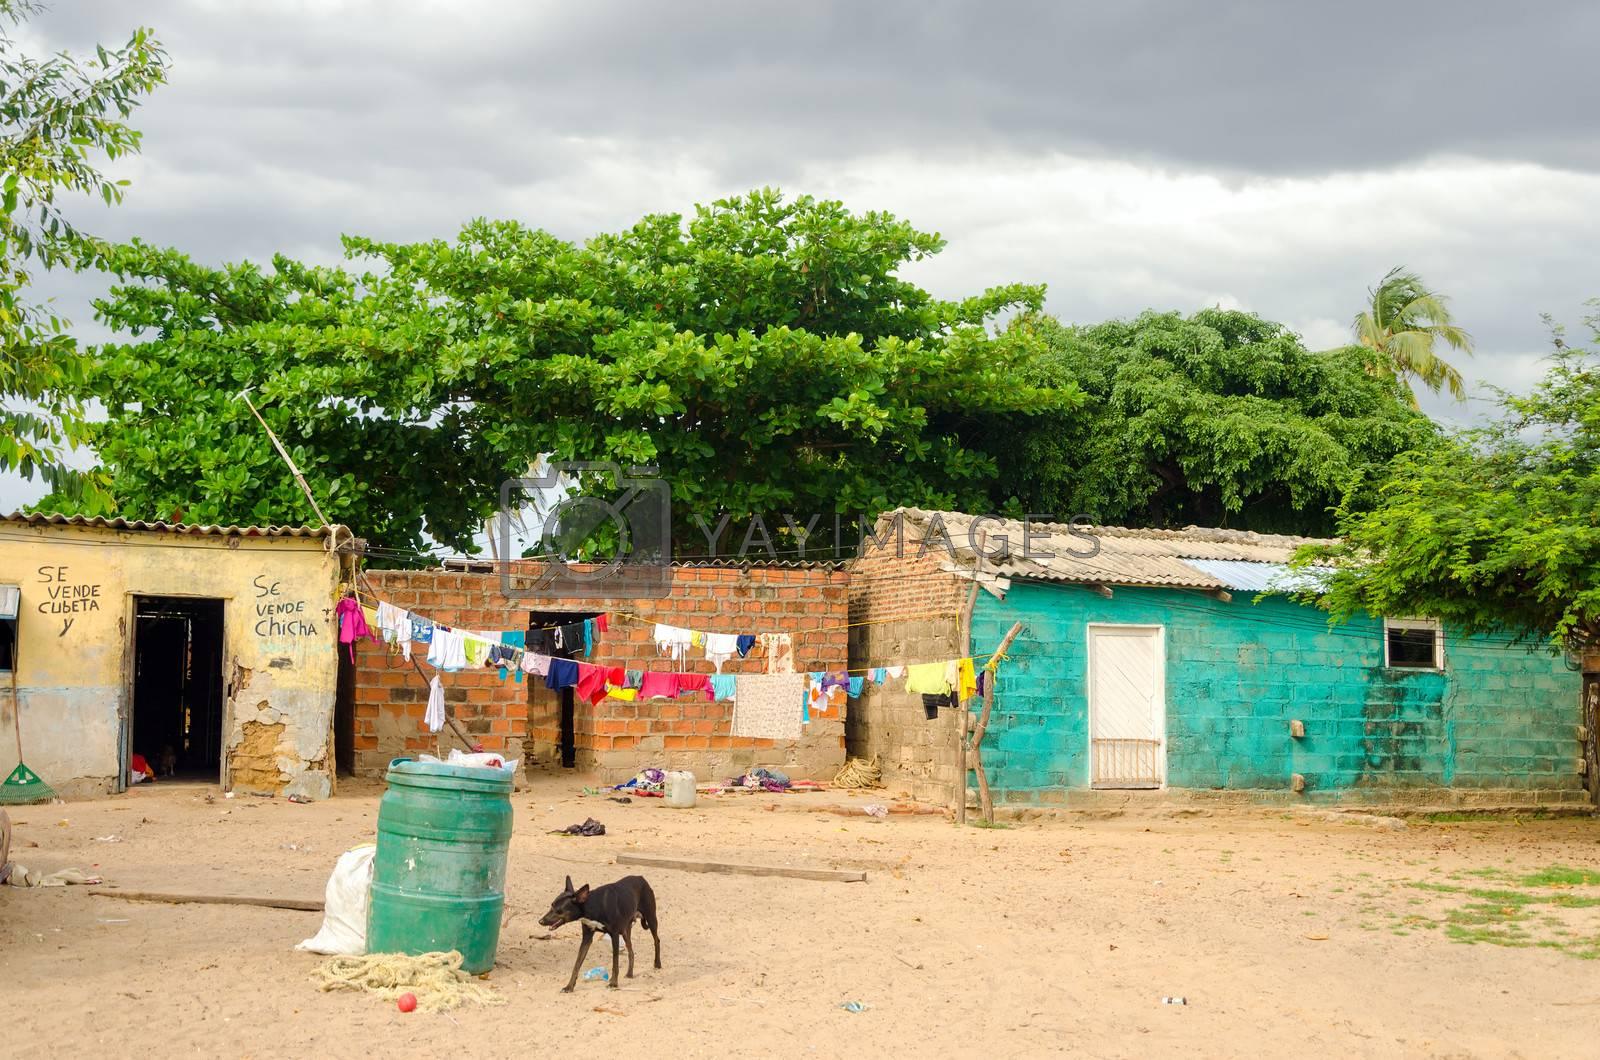 Small and poor shacks in La Guajira, Colombia